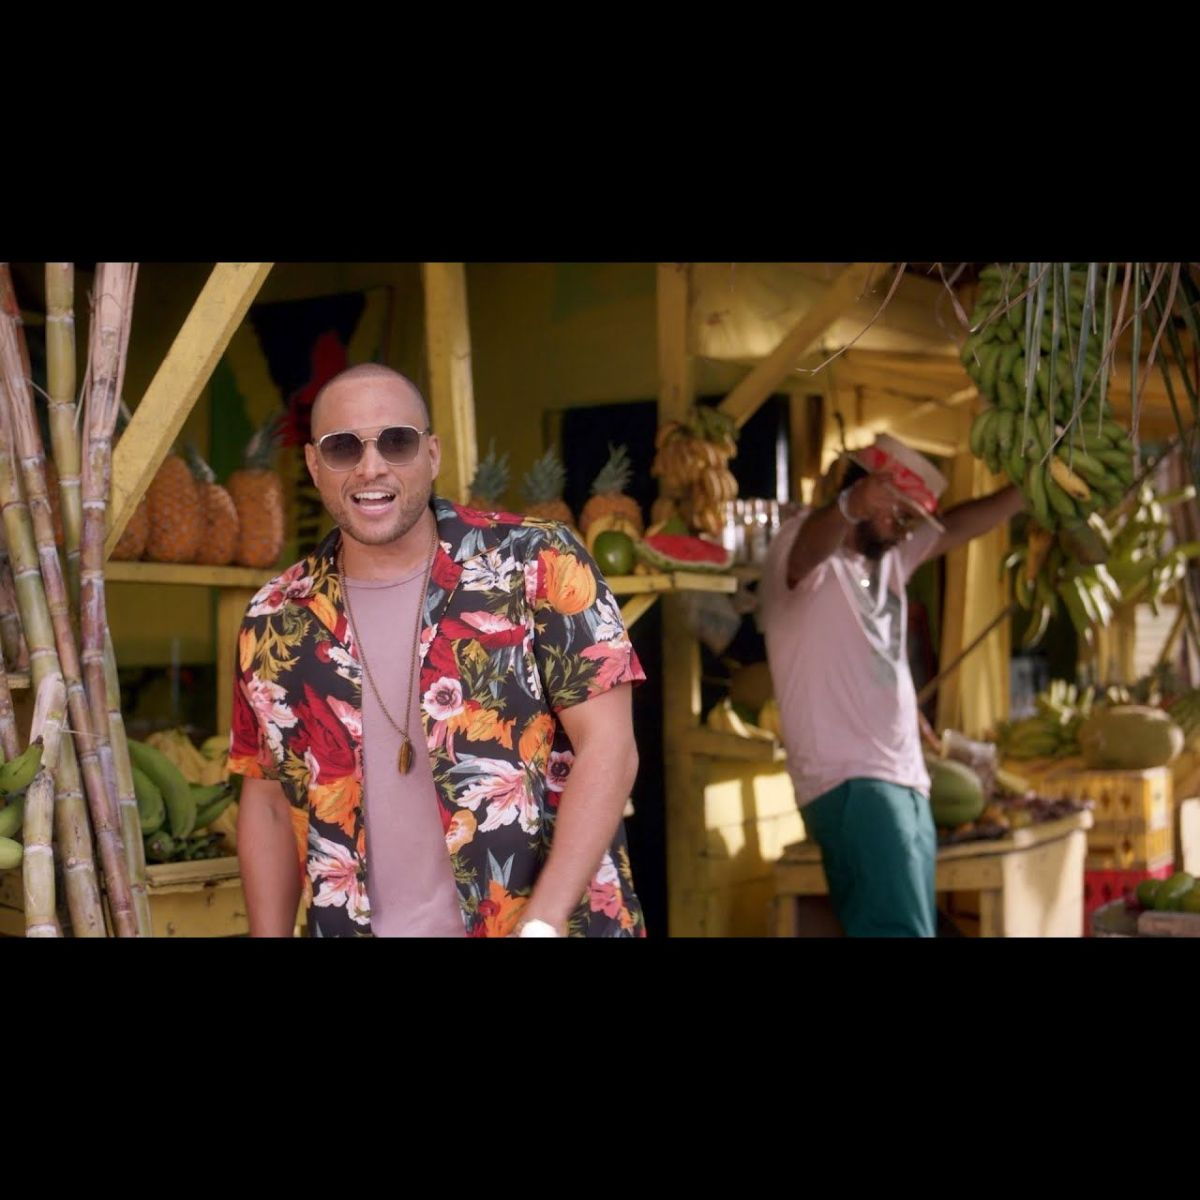 Conkarah - Banana (ft. Shaggy) (DJ FLe - Minisiren Remix) (Thumbnail)